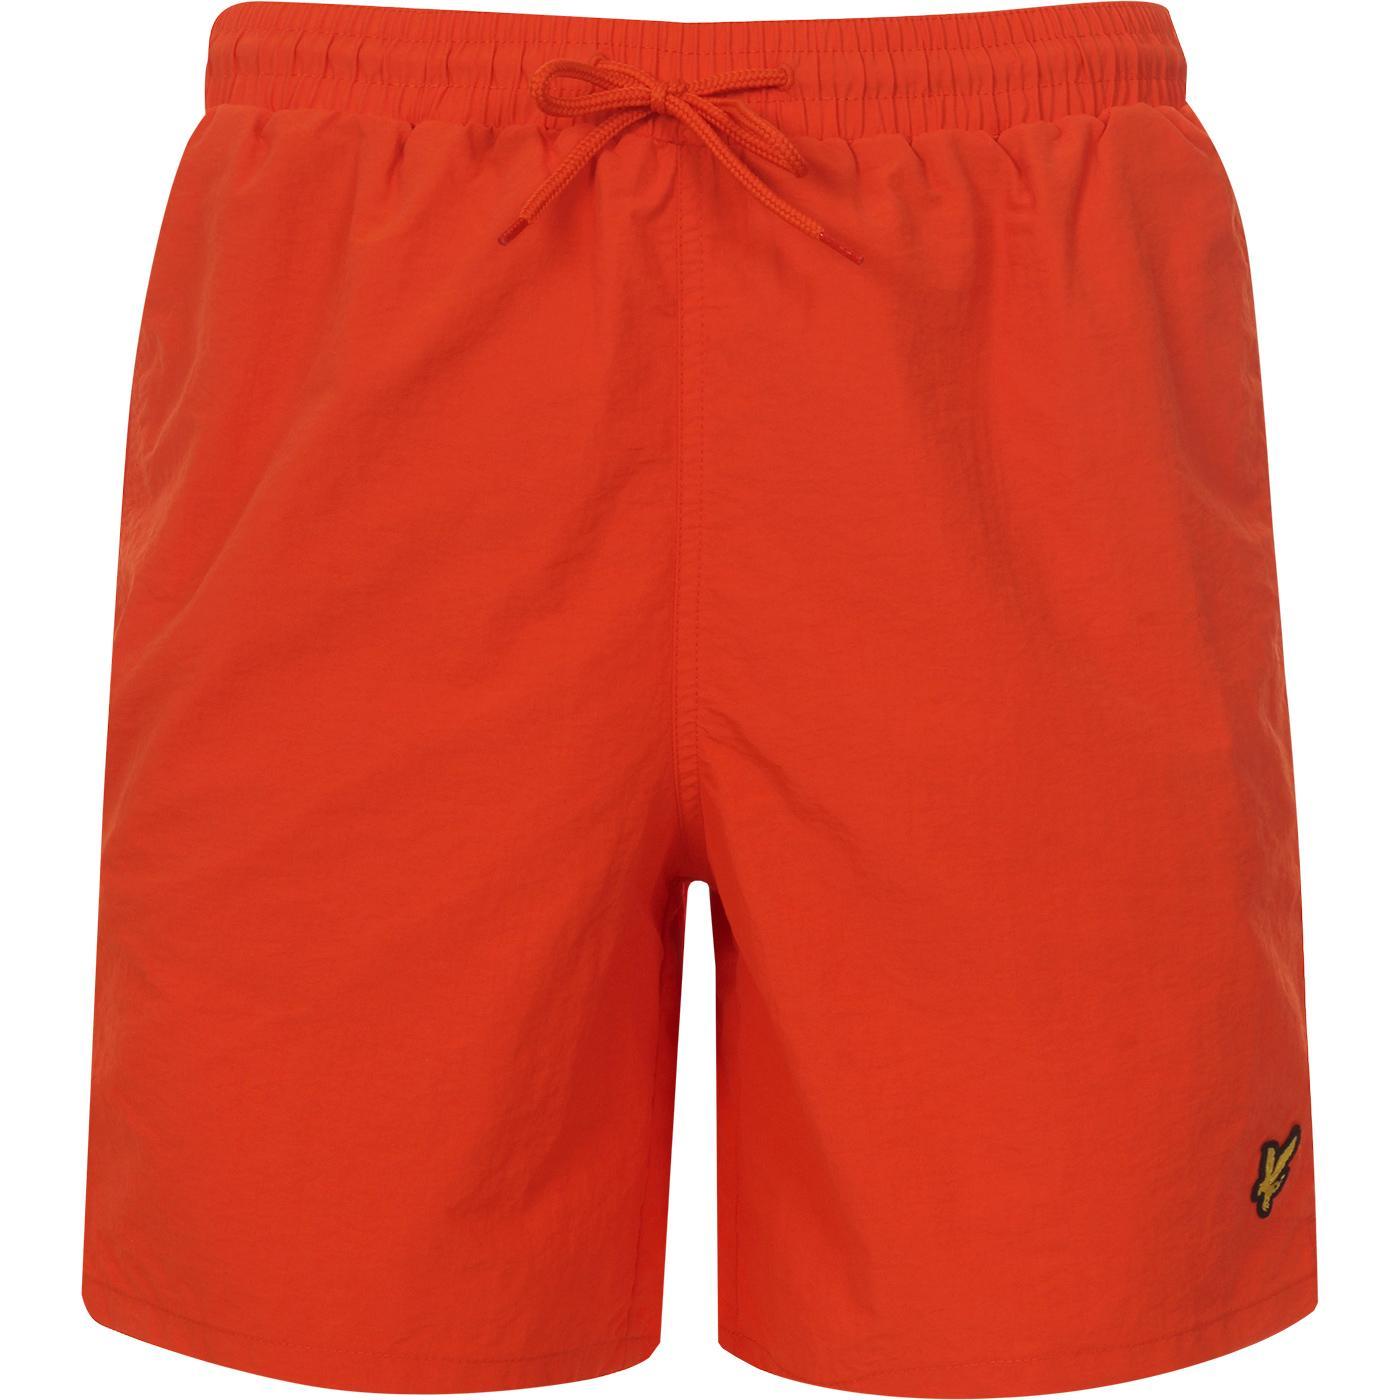 LYLE & SCOTT Mens Plain Retro Swim Shorts (Orange)